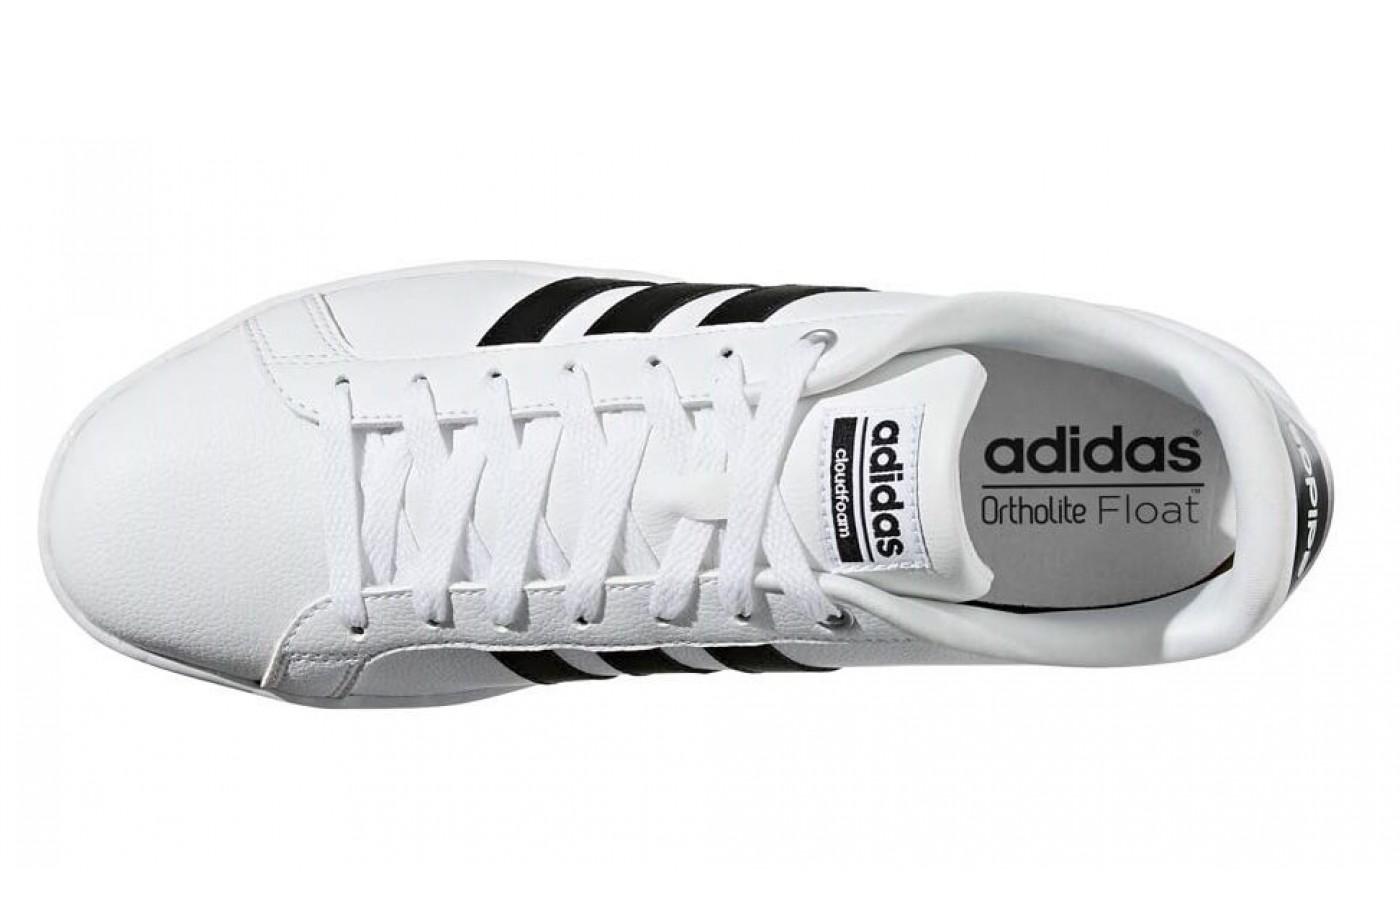 Adidas Cloudfoam Advantage Reviewed & Rated in 2019 | WalkJogRun